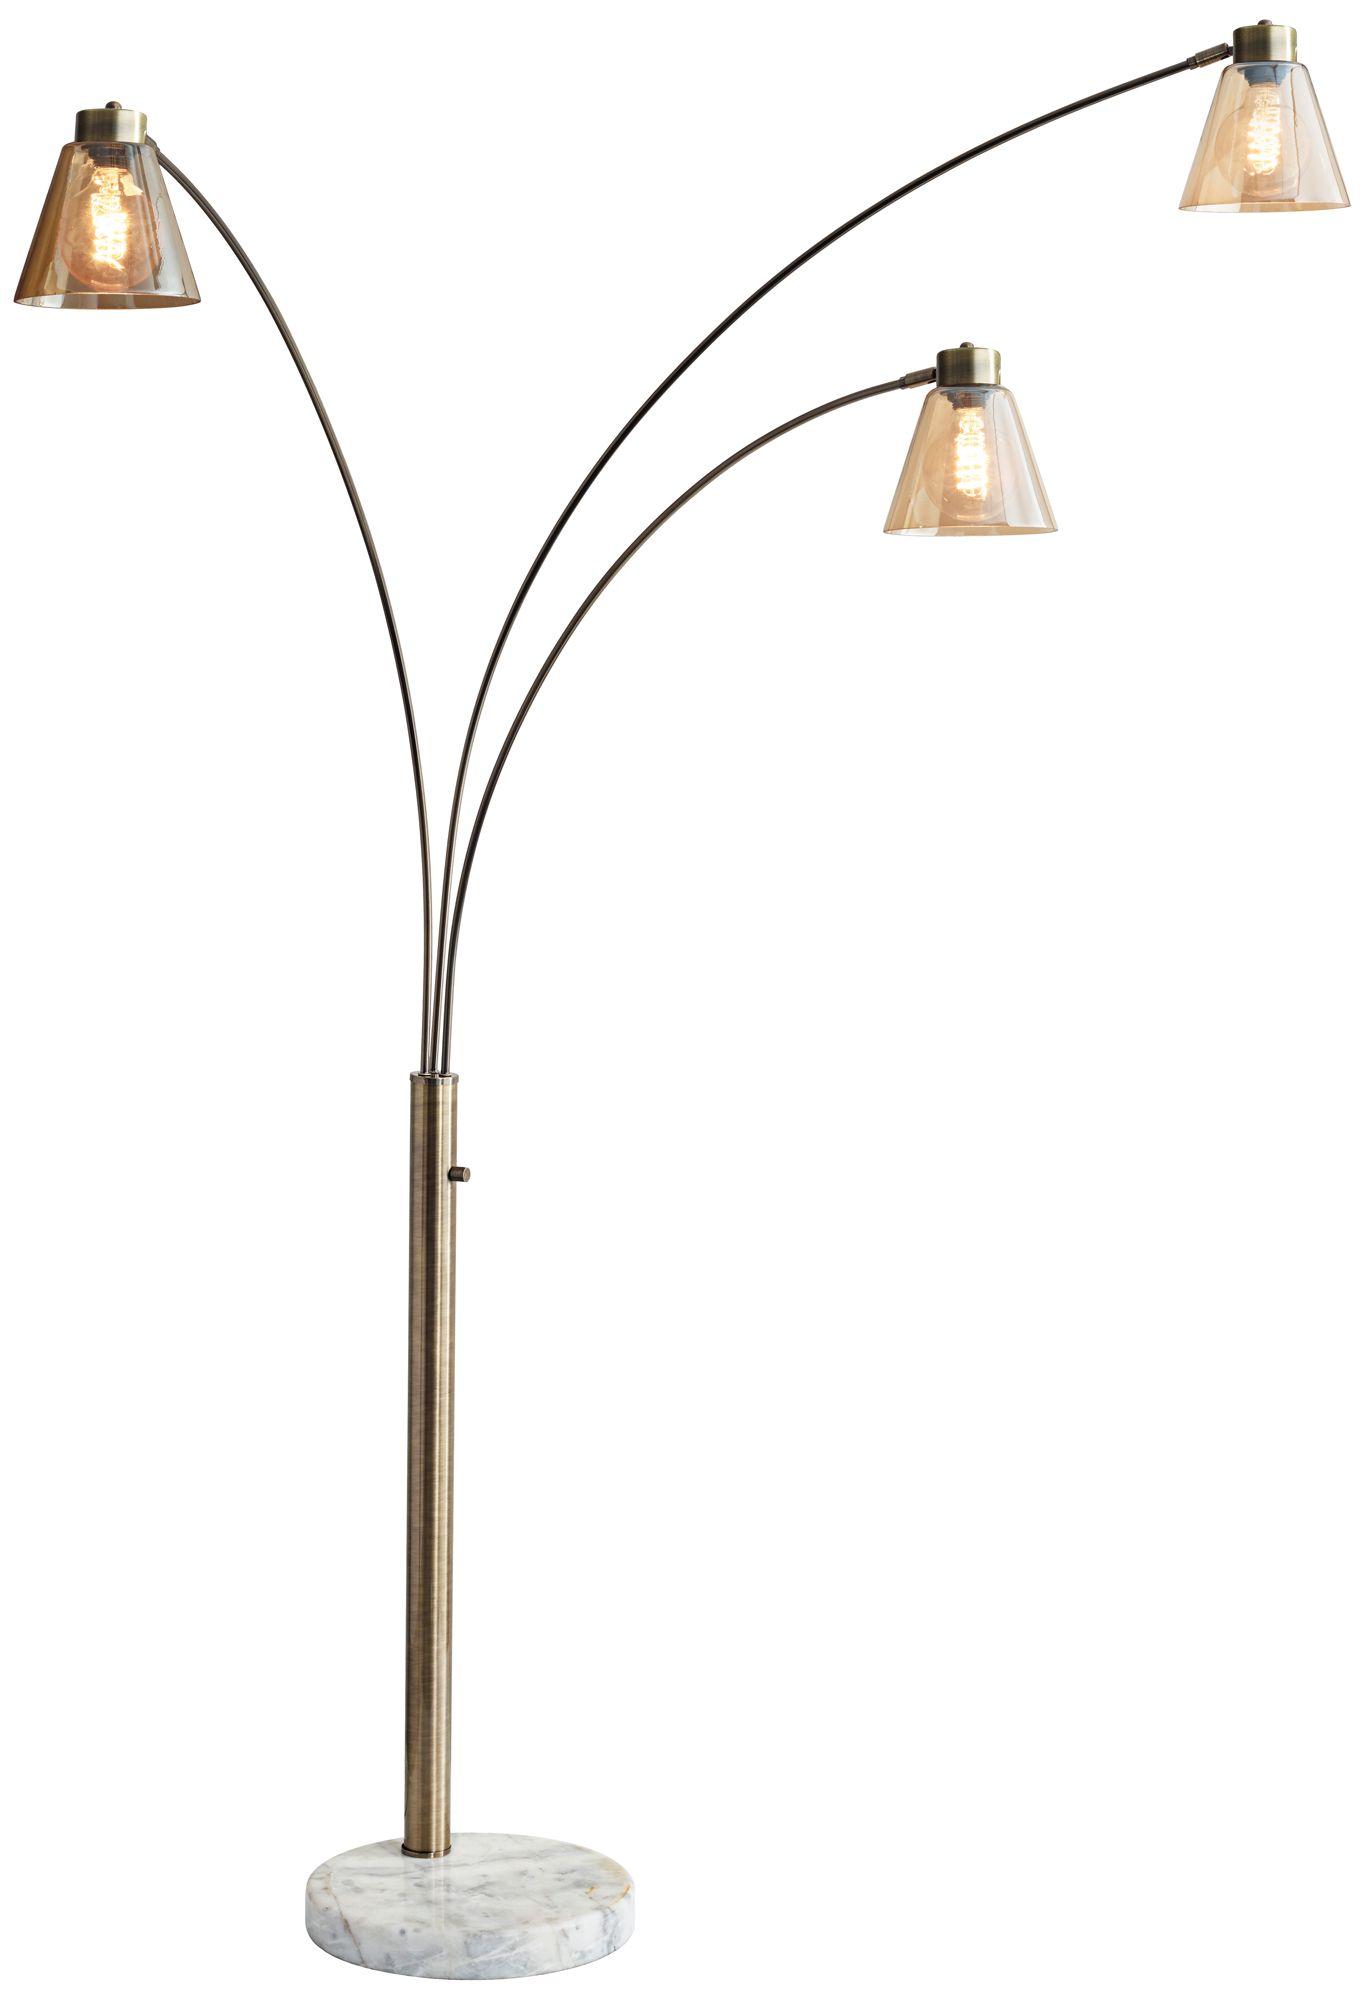 Charmant Sienna Antique Brass Adjustable 3 Arm Arc Floor Lamp